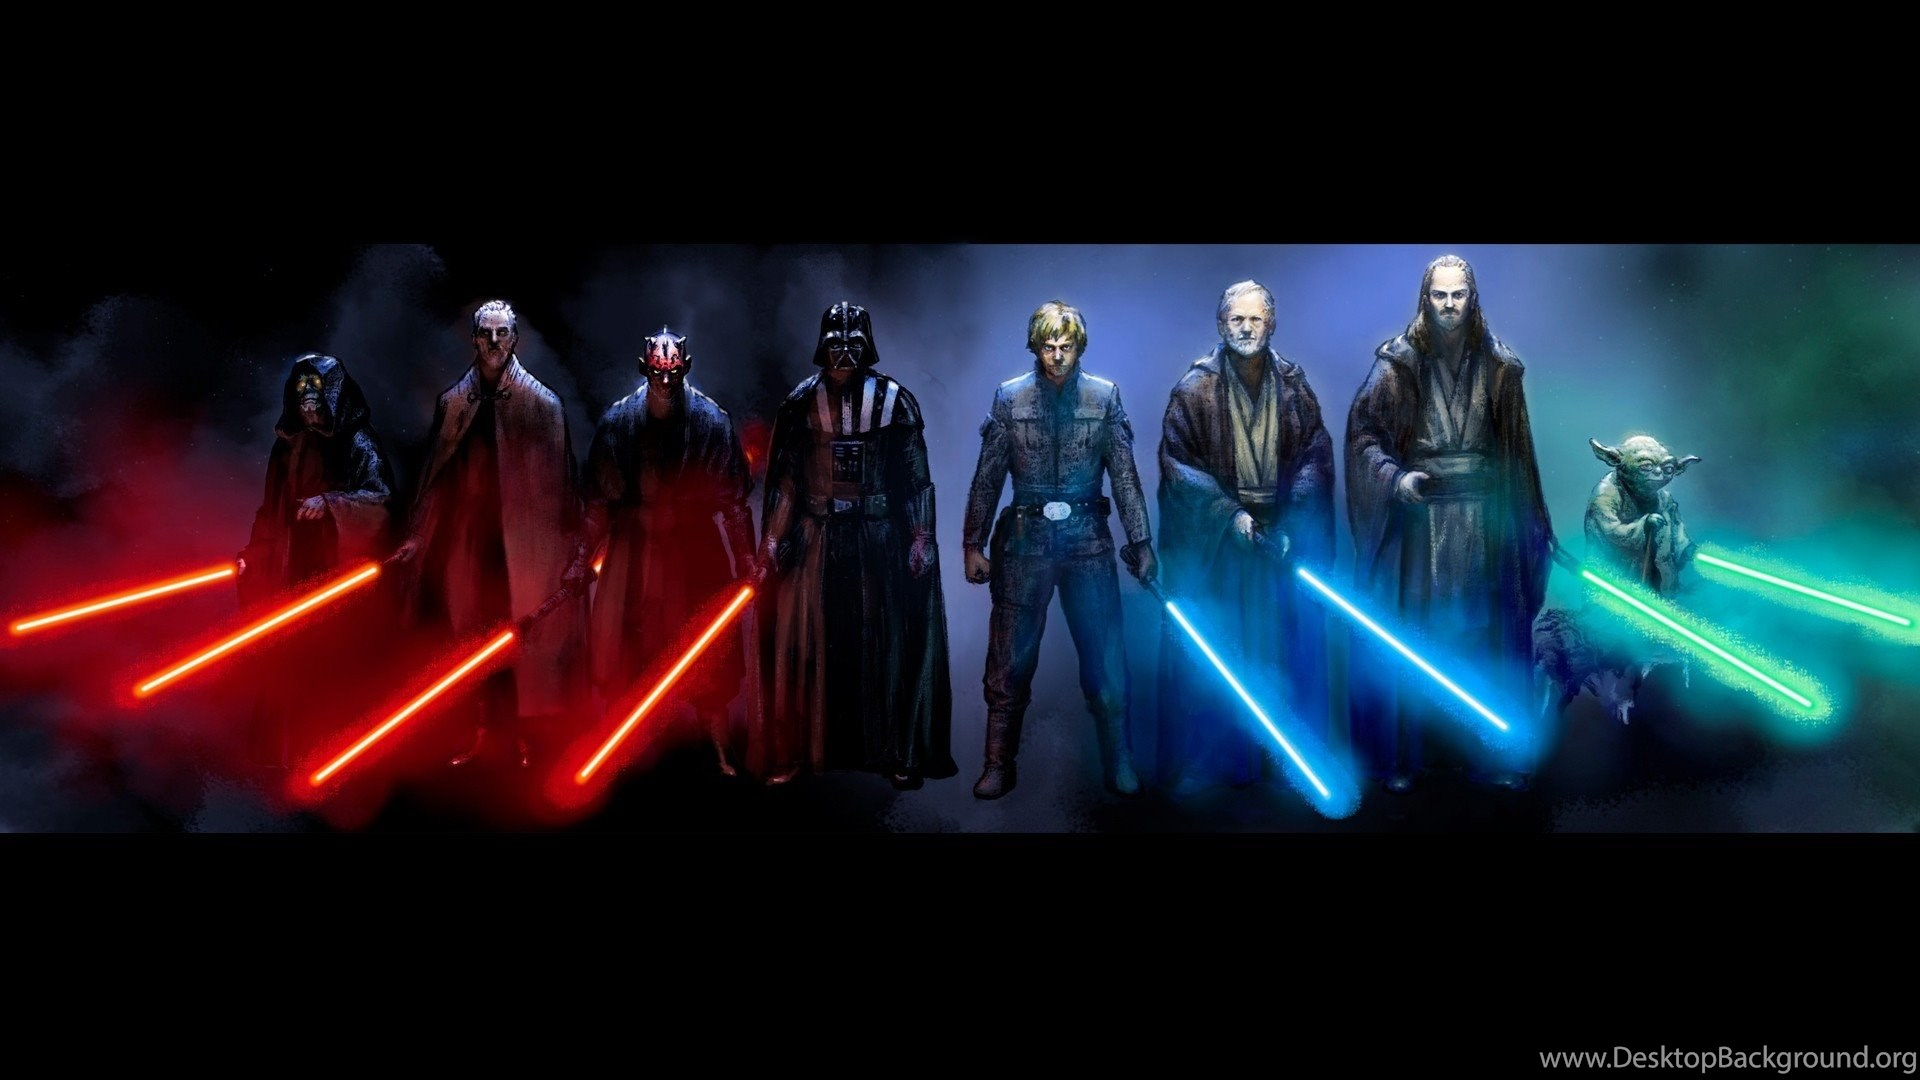 Anakin Skywalker Darth Vader Sith Jedi Fan Art Star Wars Hd Desktop Background